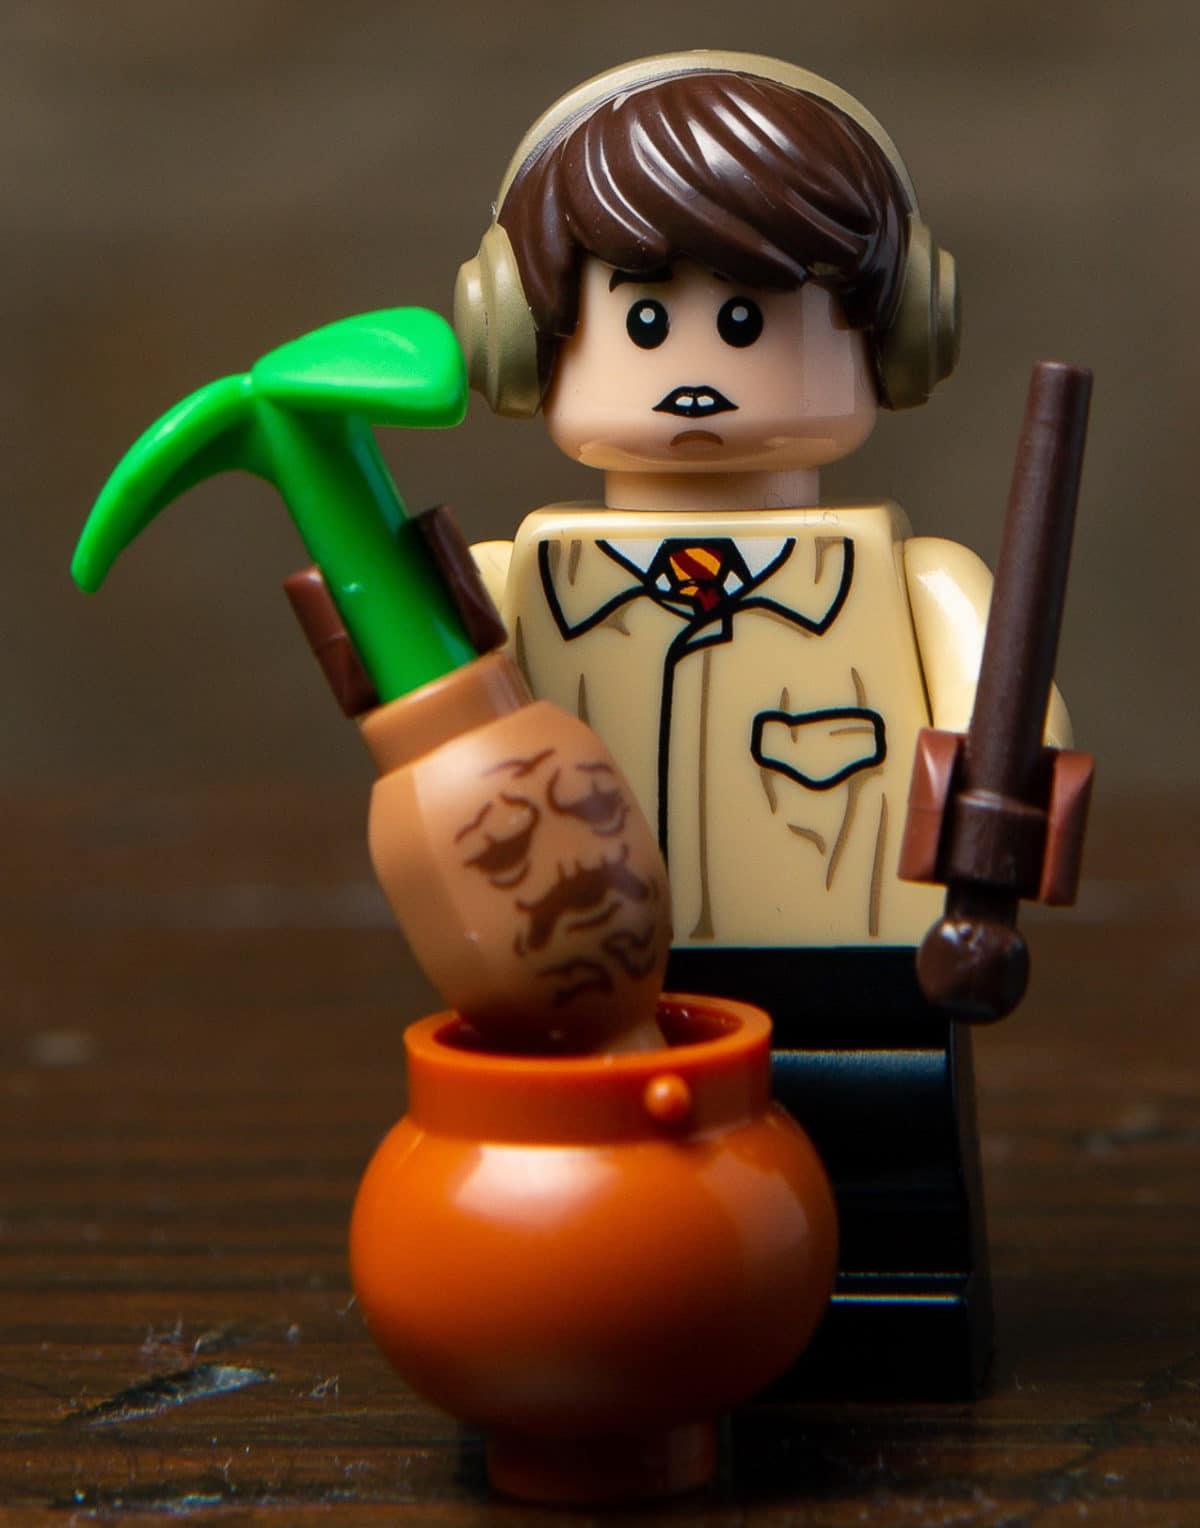 LEGO 71022 Neville Longbottom